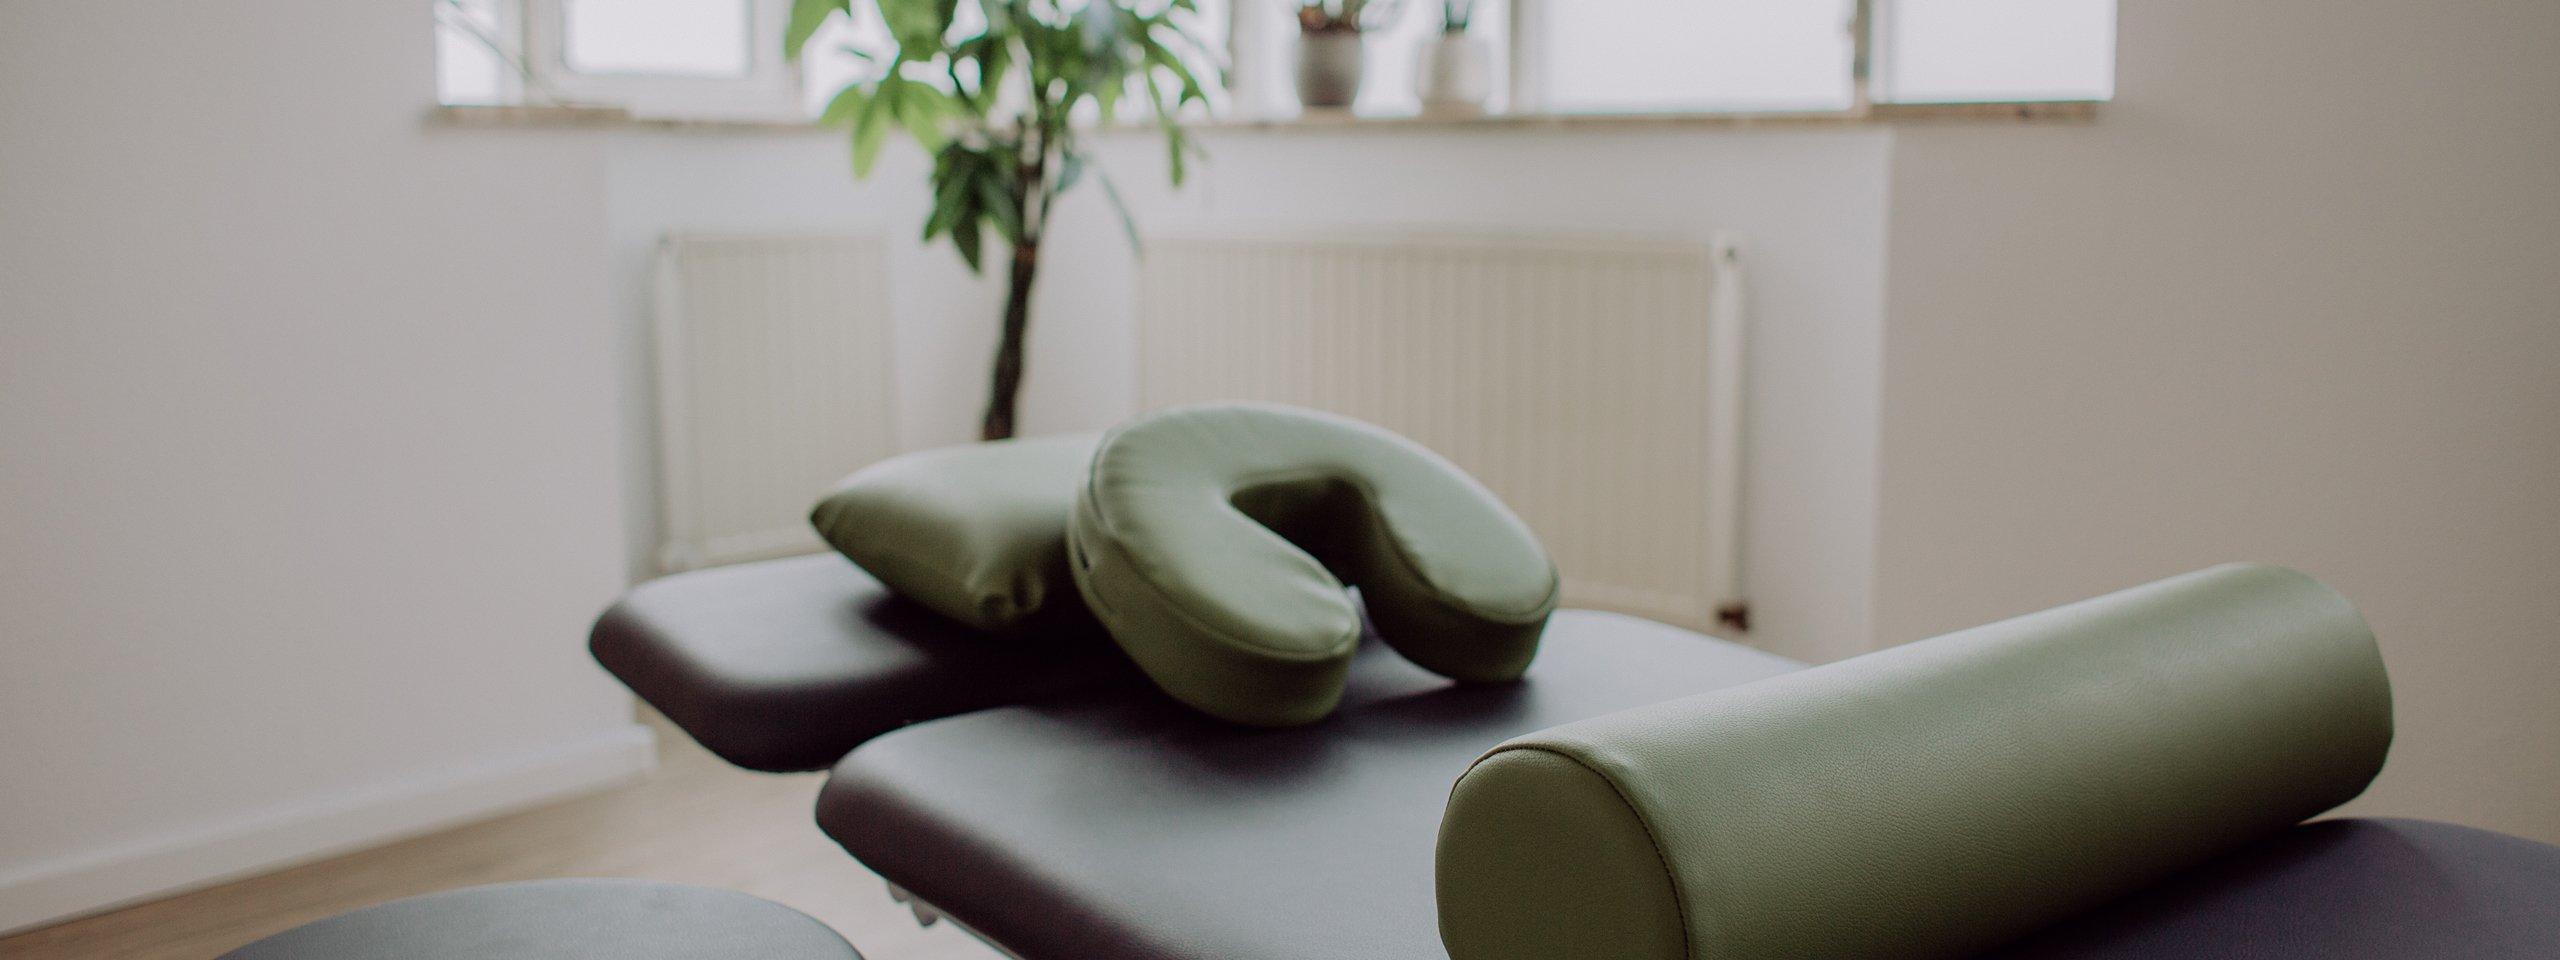 physiopraxis_therapiewerk-bayreuth_behandlungszimmer